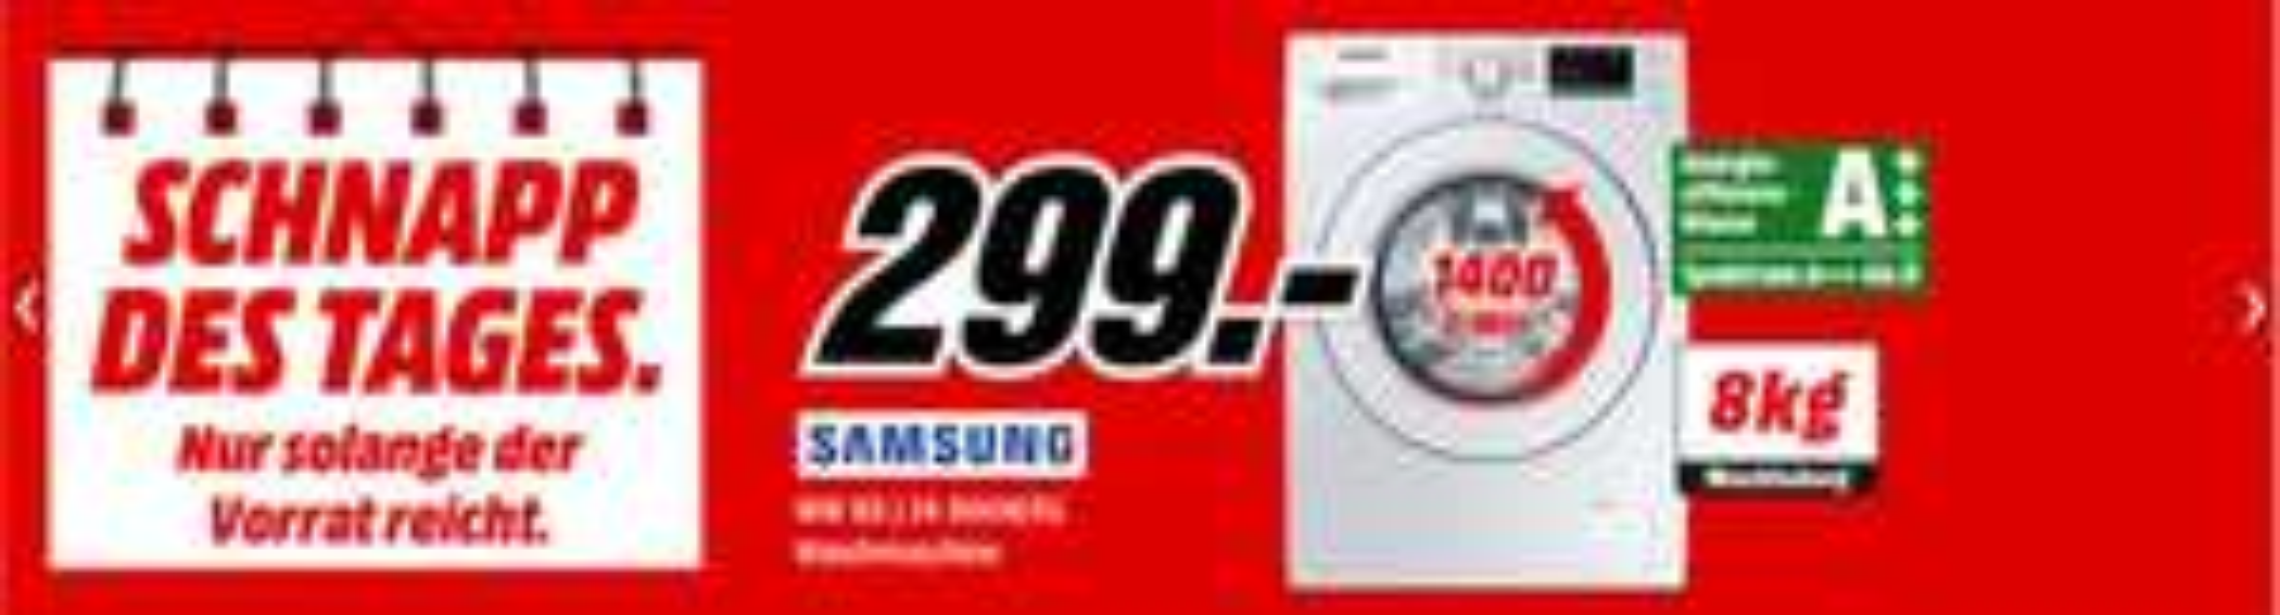 SAMSUNG WW 80 J 34 D0KW/EG Waschmaschine (8 kg, 1400 U/Min., A+++)